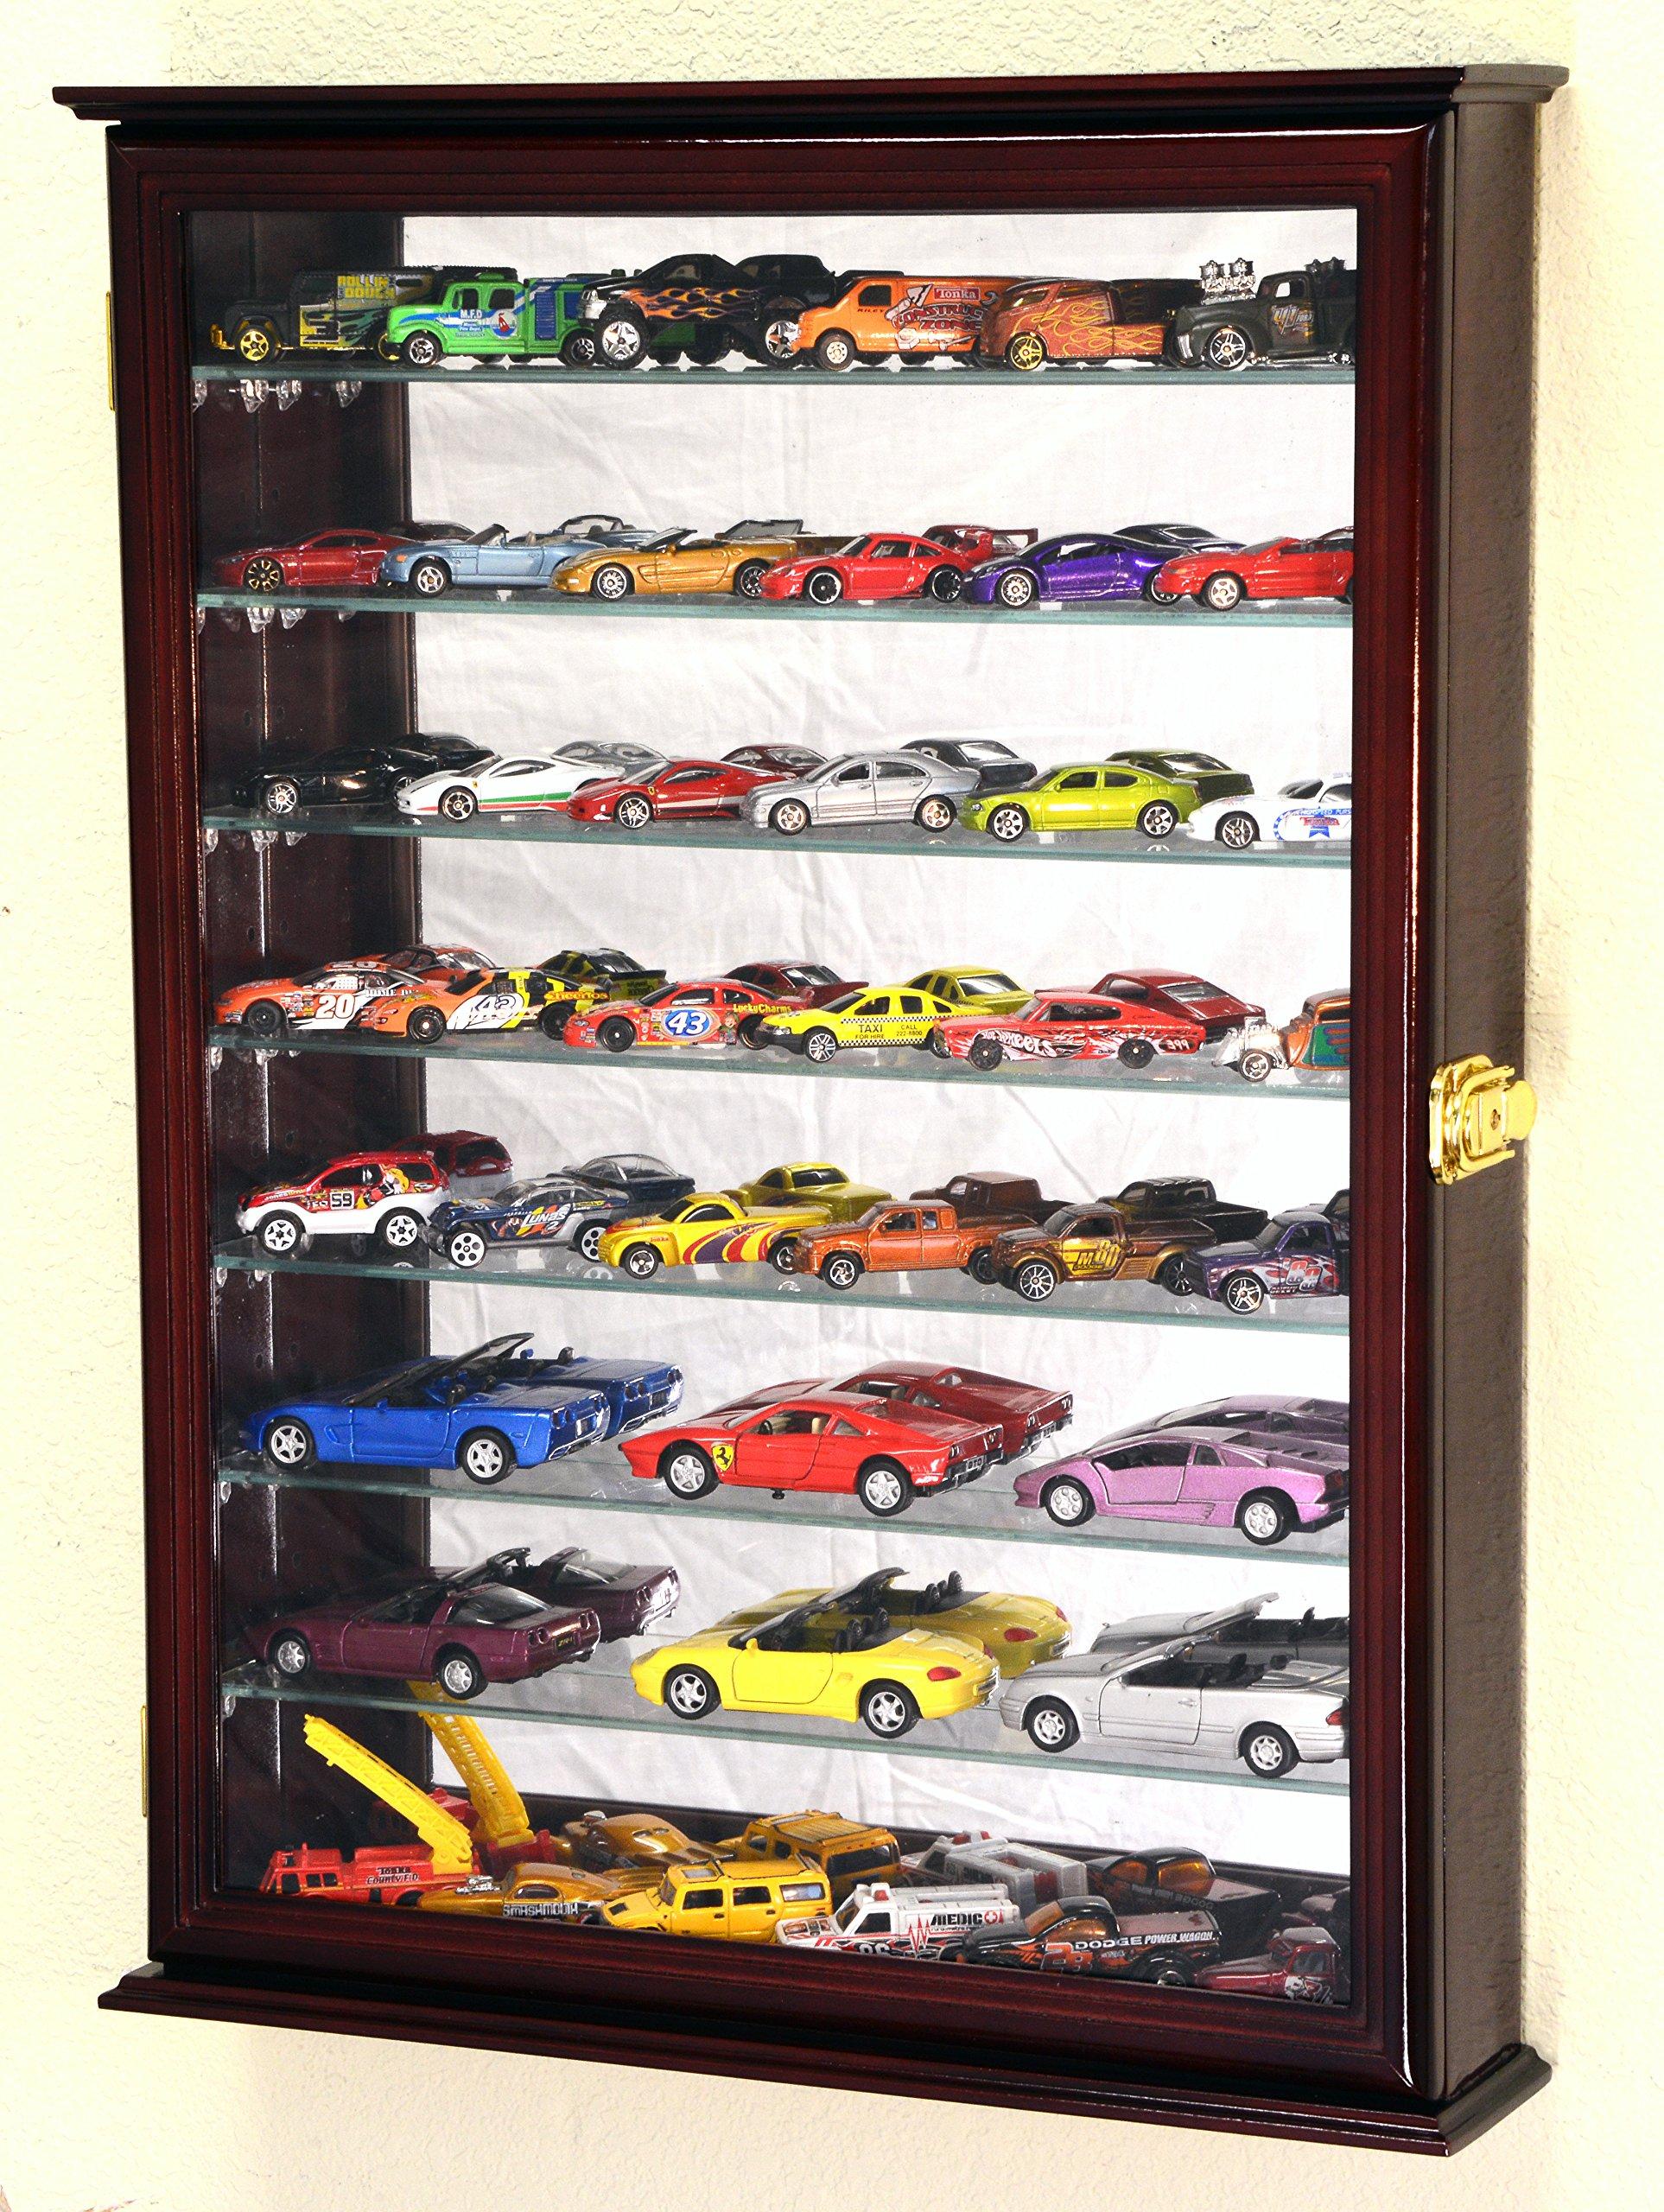 7 Adjustable Shelves Mirrored Hot Wheels/Matchbox/Diecast Cars / 1/64 1/43 Model Display Case Cabinet, Cherry